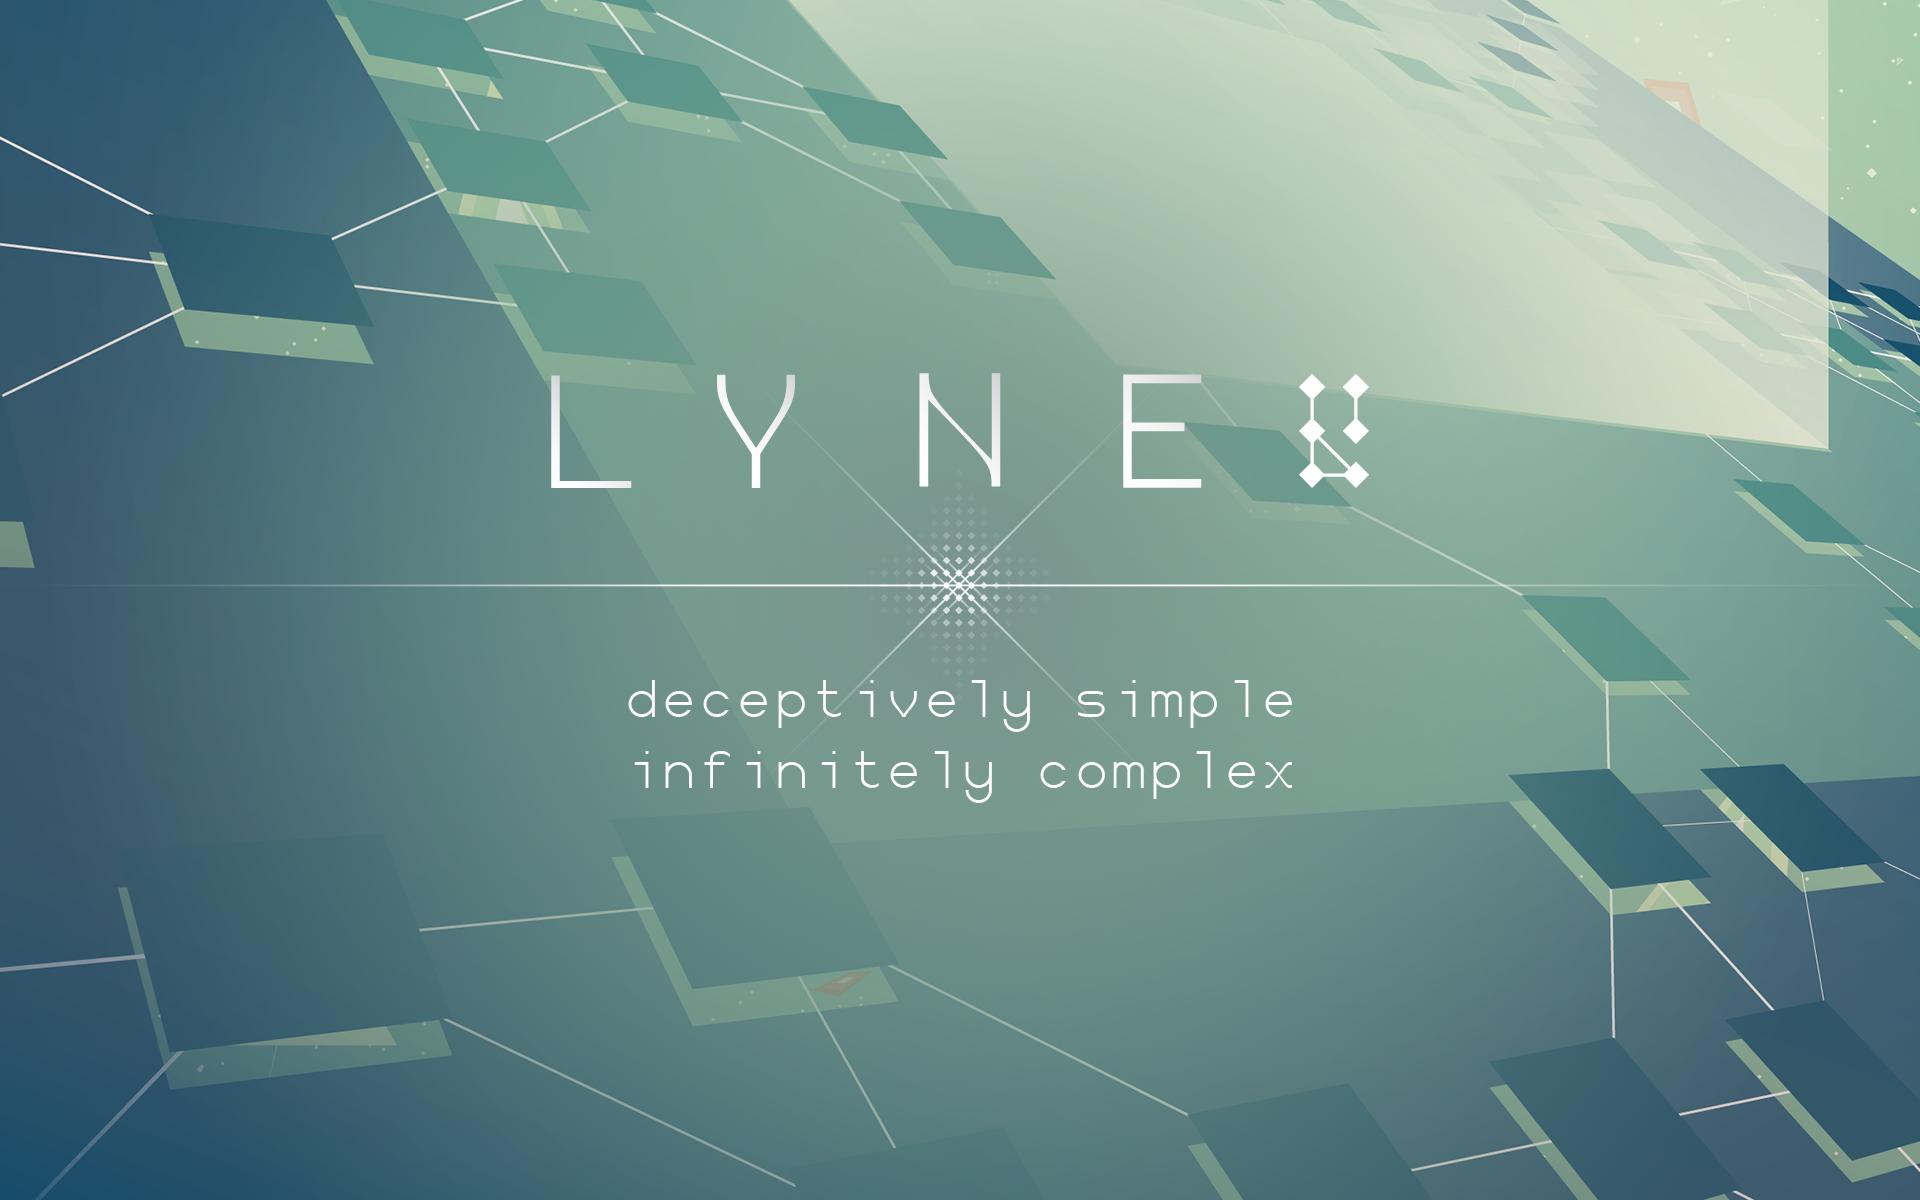 test test la bourre lyne pc mac ios mobile linux thomas bowker factornews. Black Bedroom Furniture Sets. Home Design Ideas